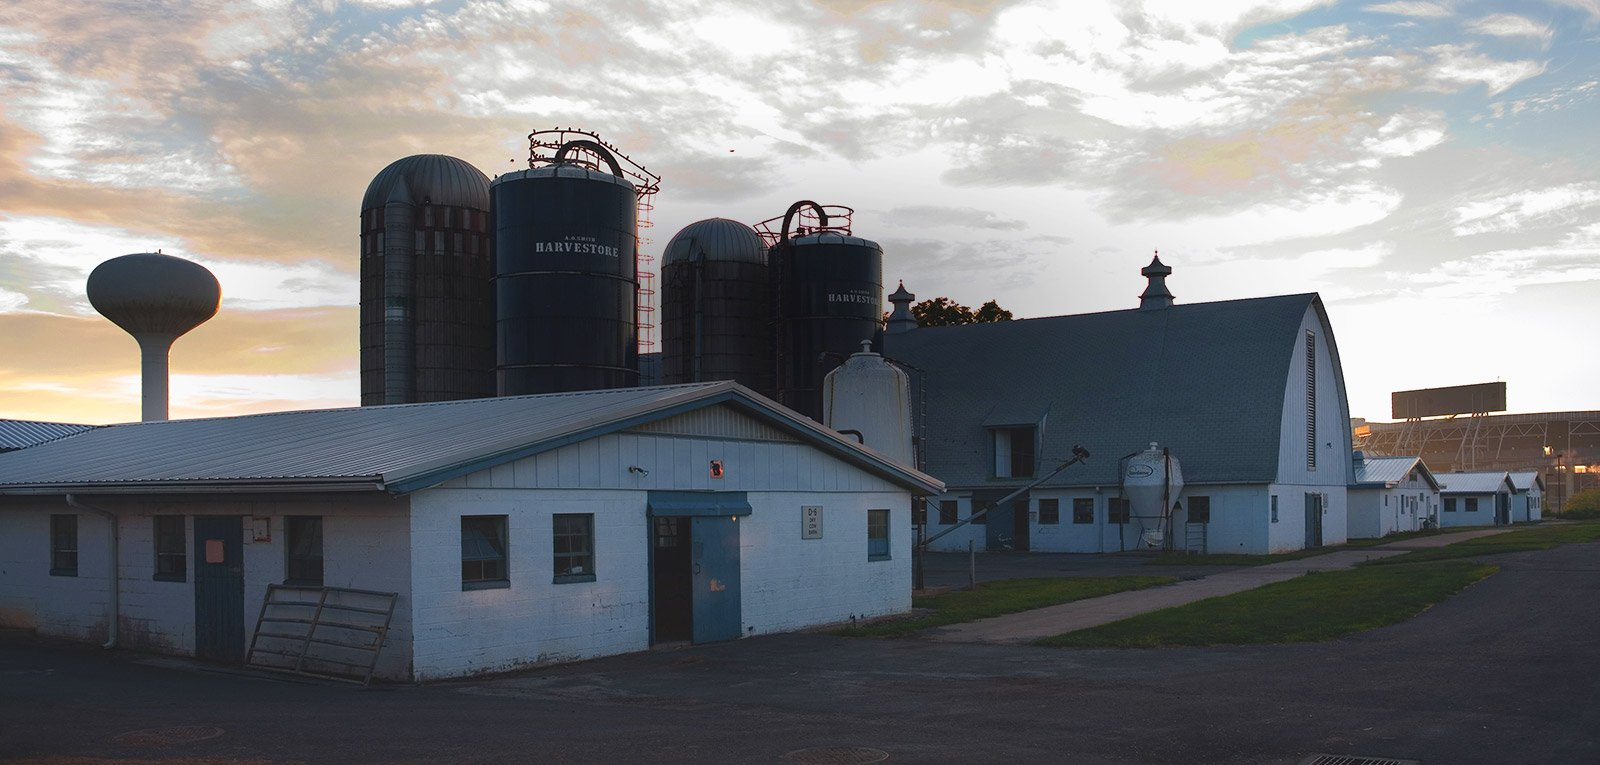 Penn State dairy barns